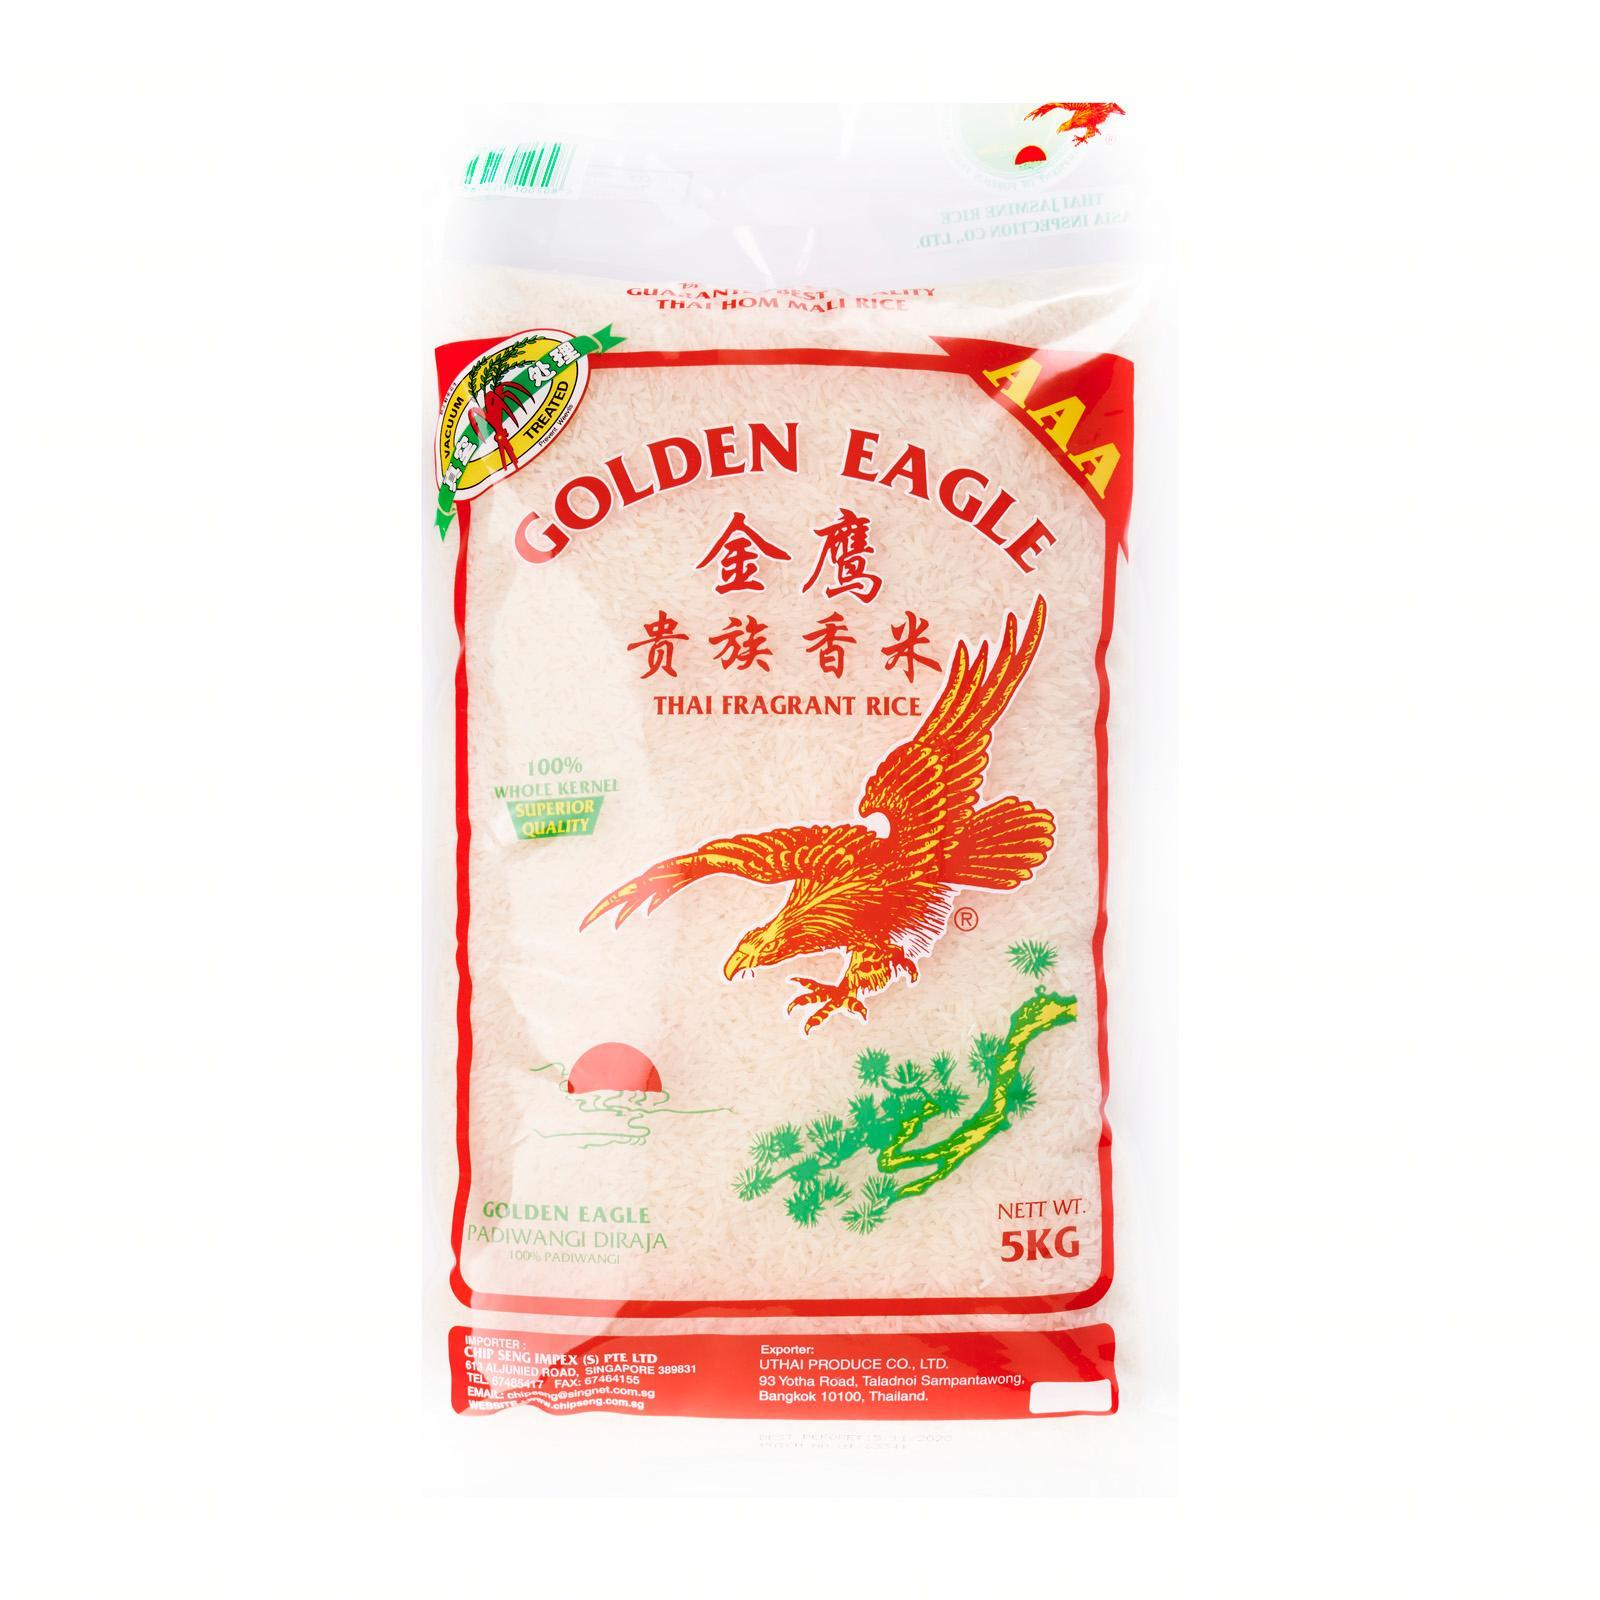 Golden Eagle Thai Fragrant Rice